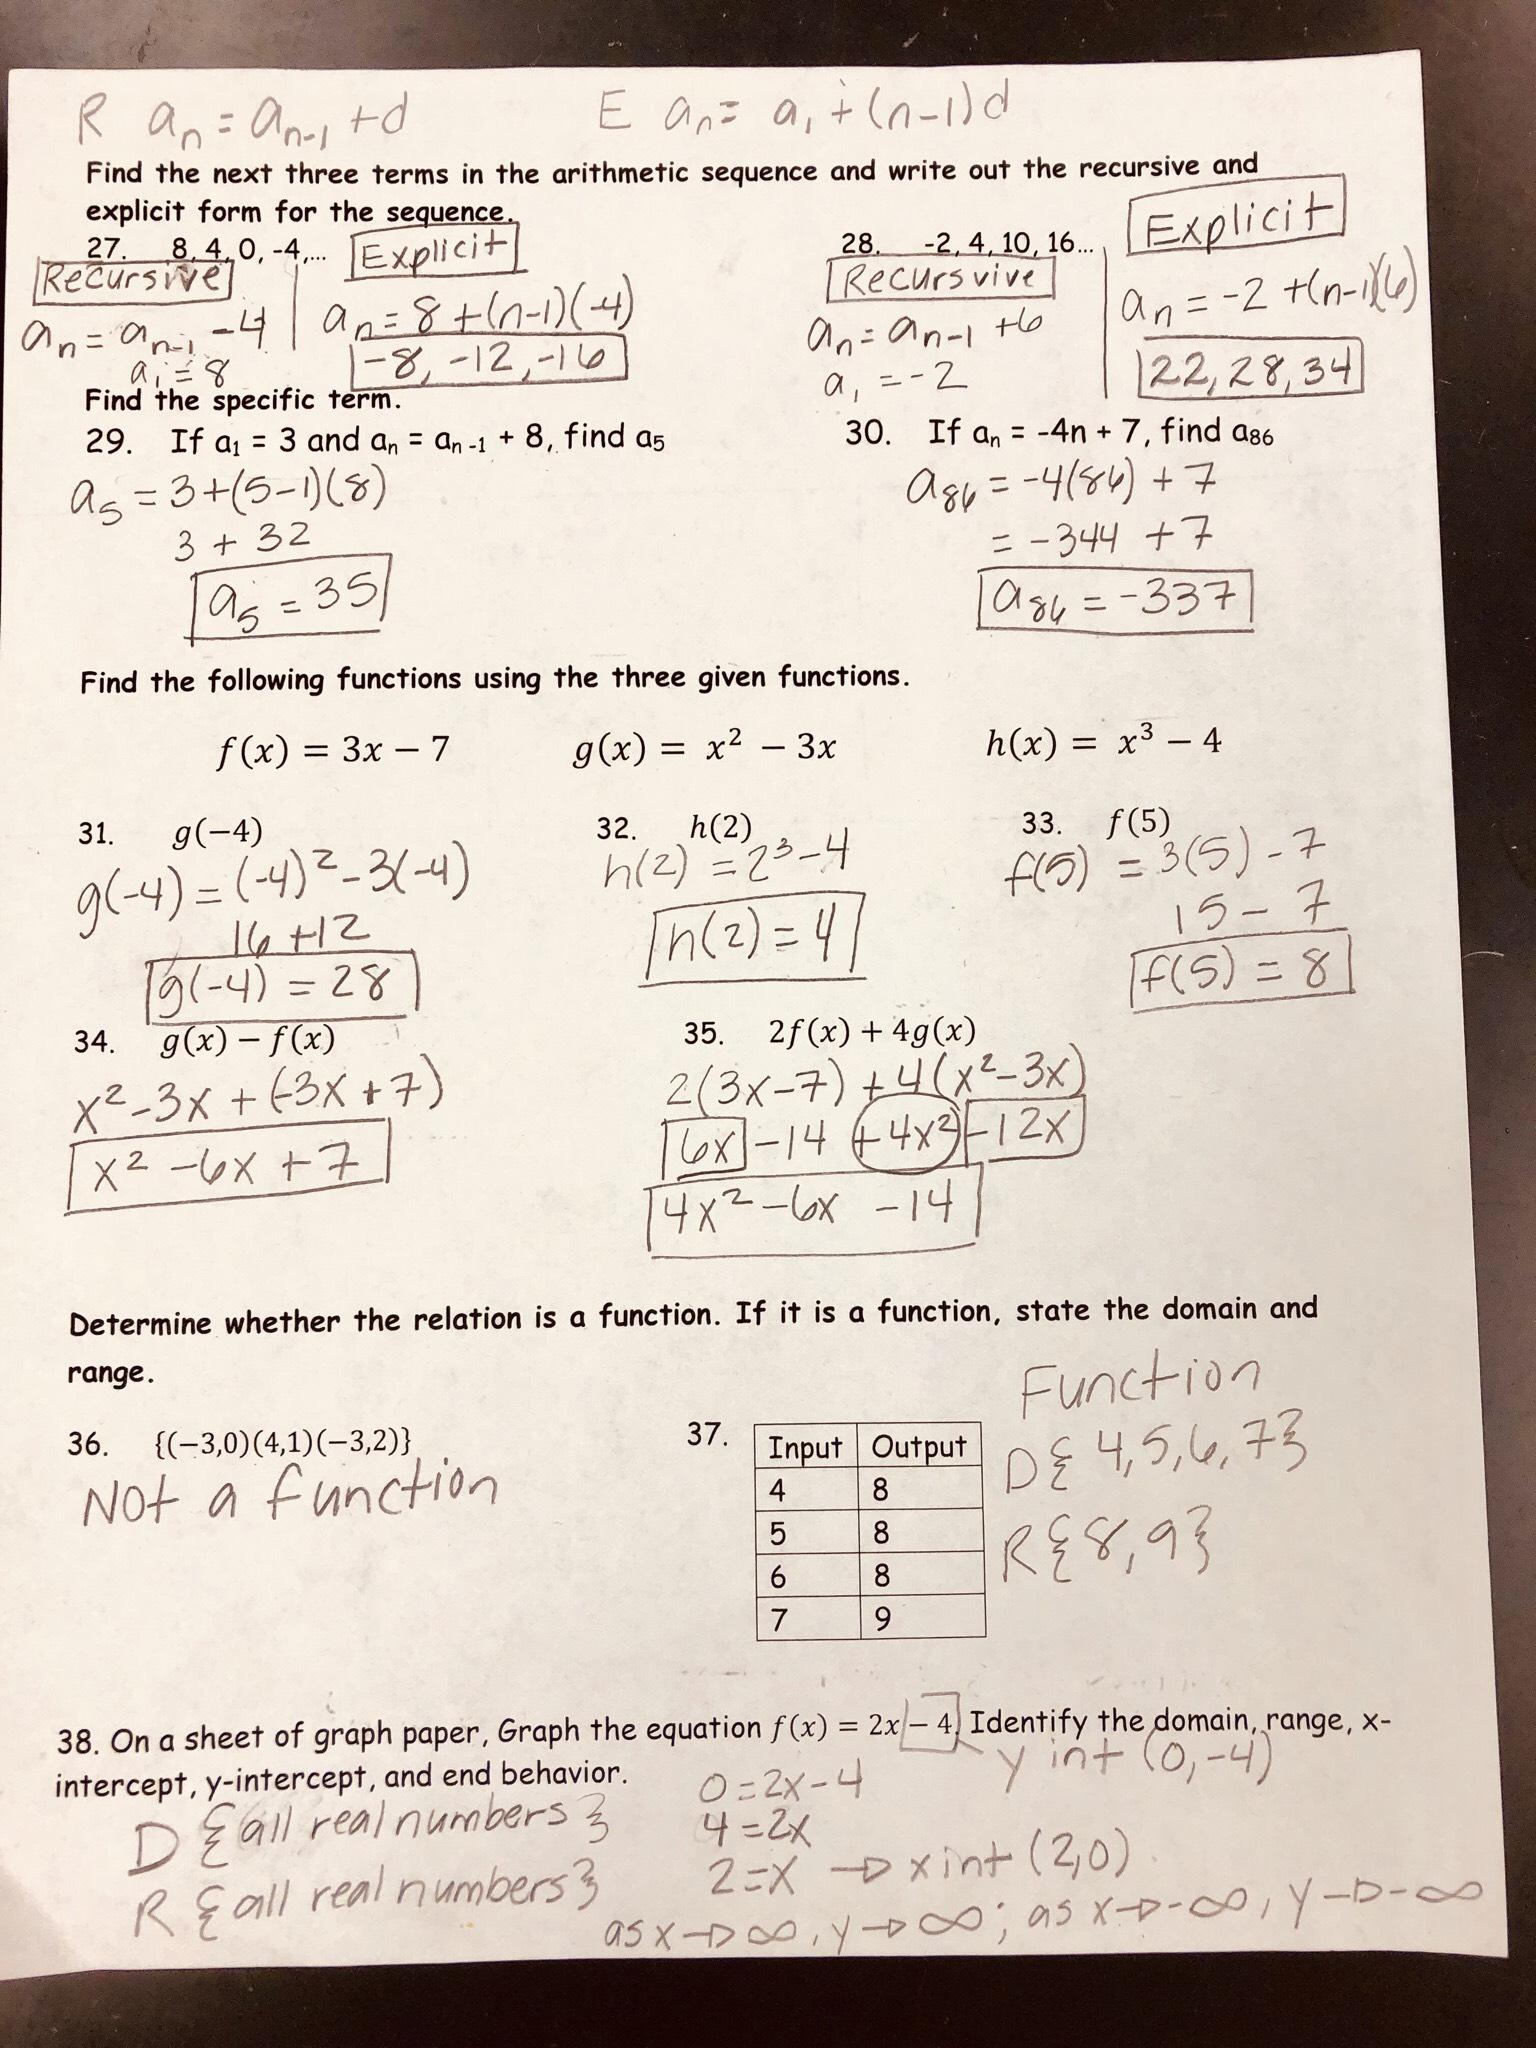 Unit 4 Test Study Guide Solving Quadratic Equations Gina